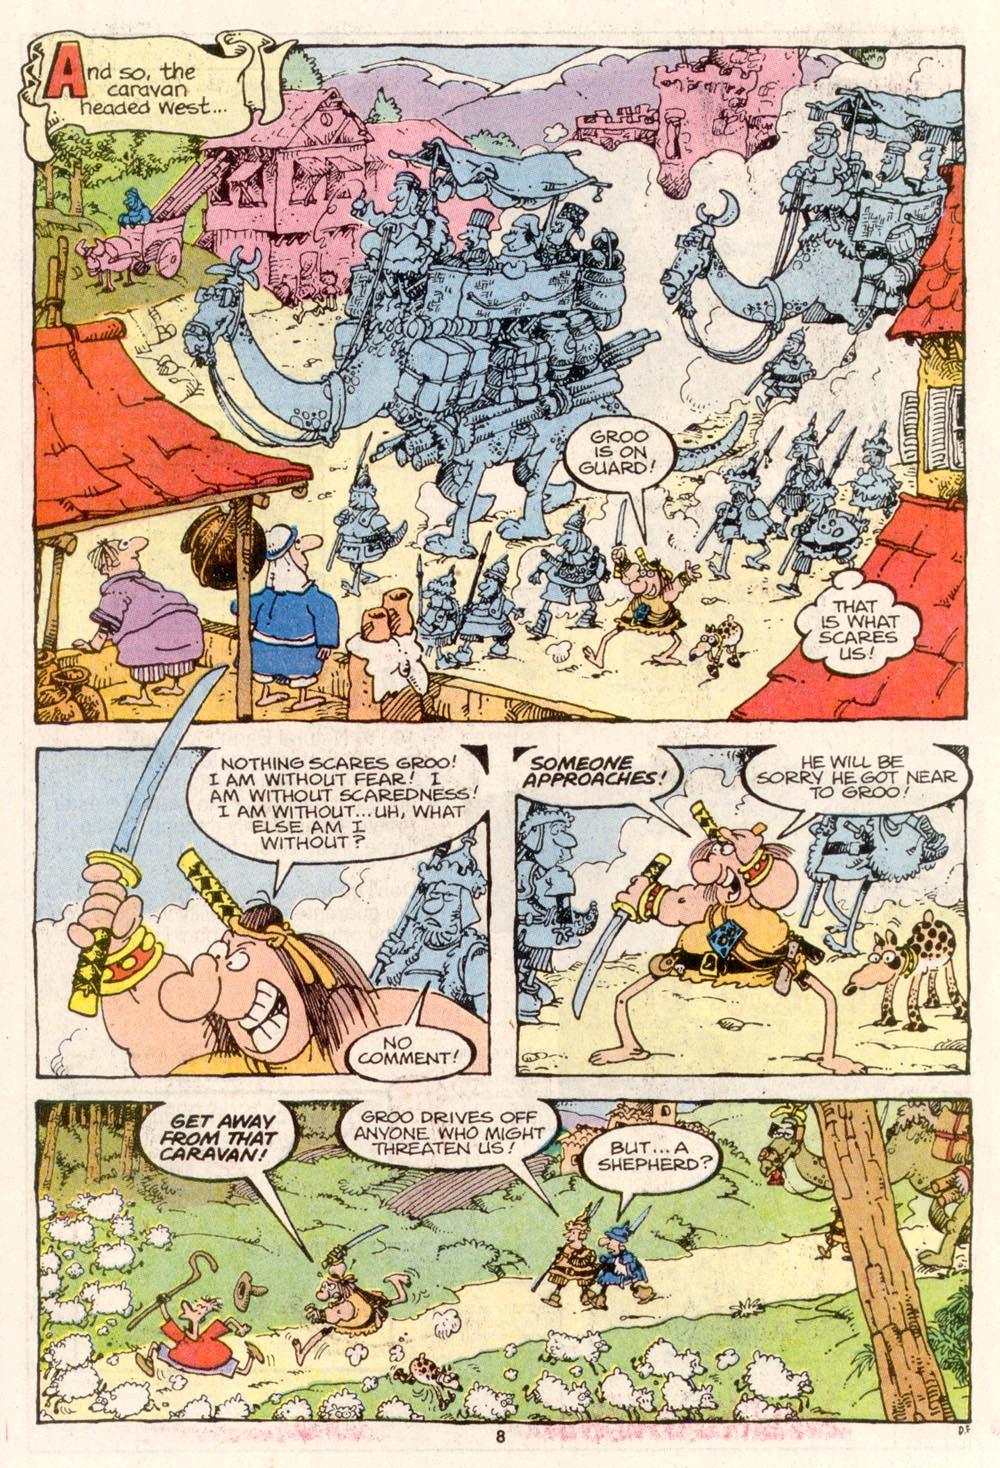 Read online Sergio Aragonés Groo the Wanderer comic -  Issue #80 - 6